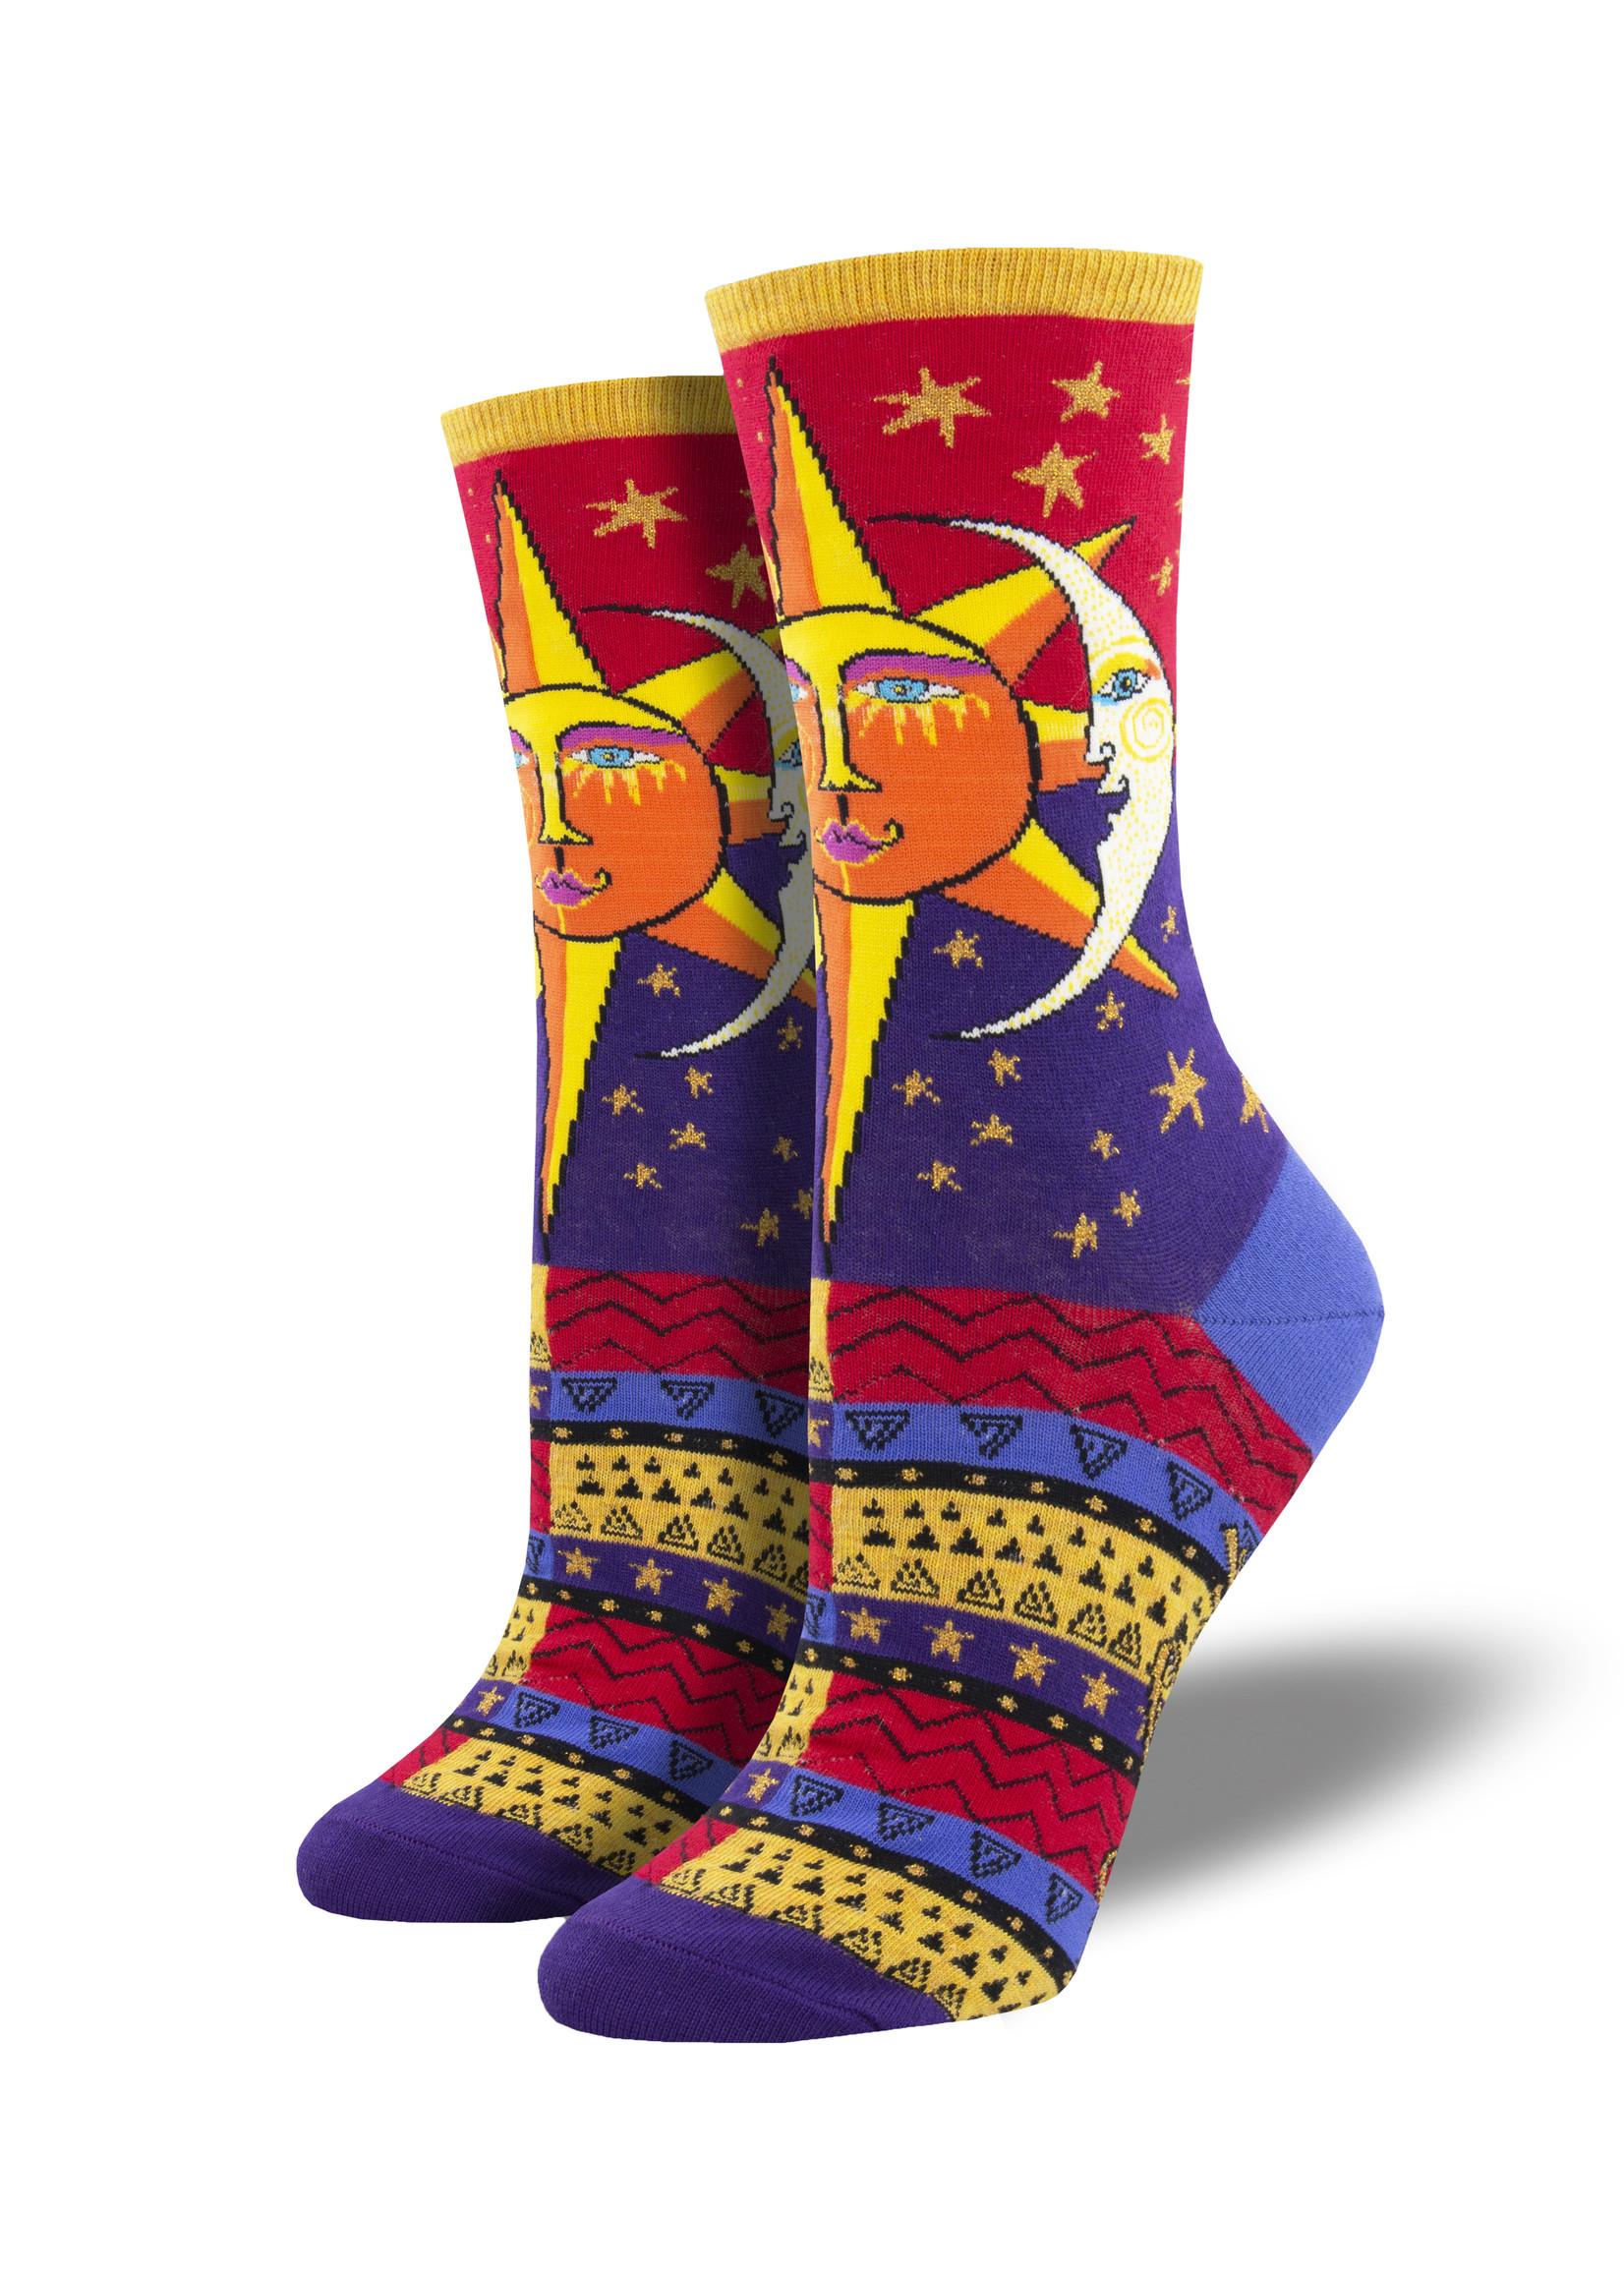 Socksmith Canada Inc WOMEN'S SUN AND MOON SOCKS